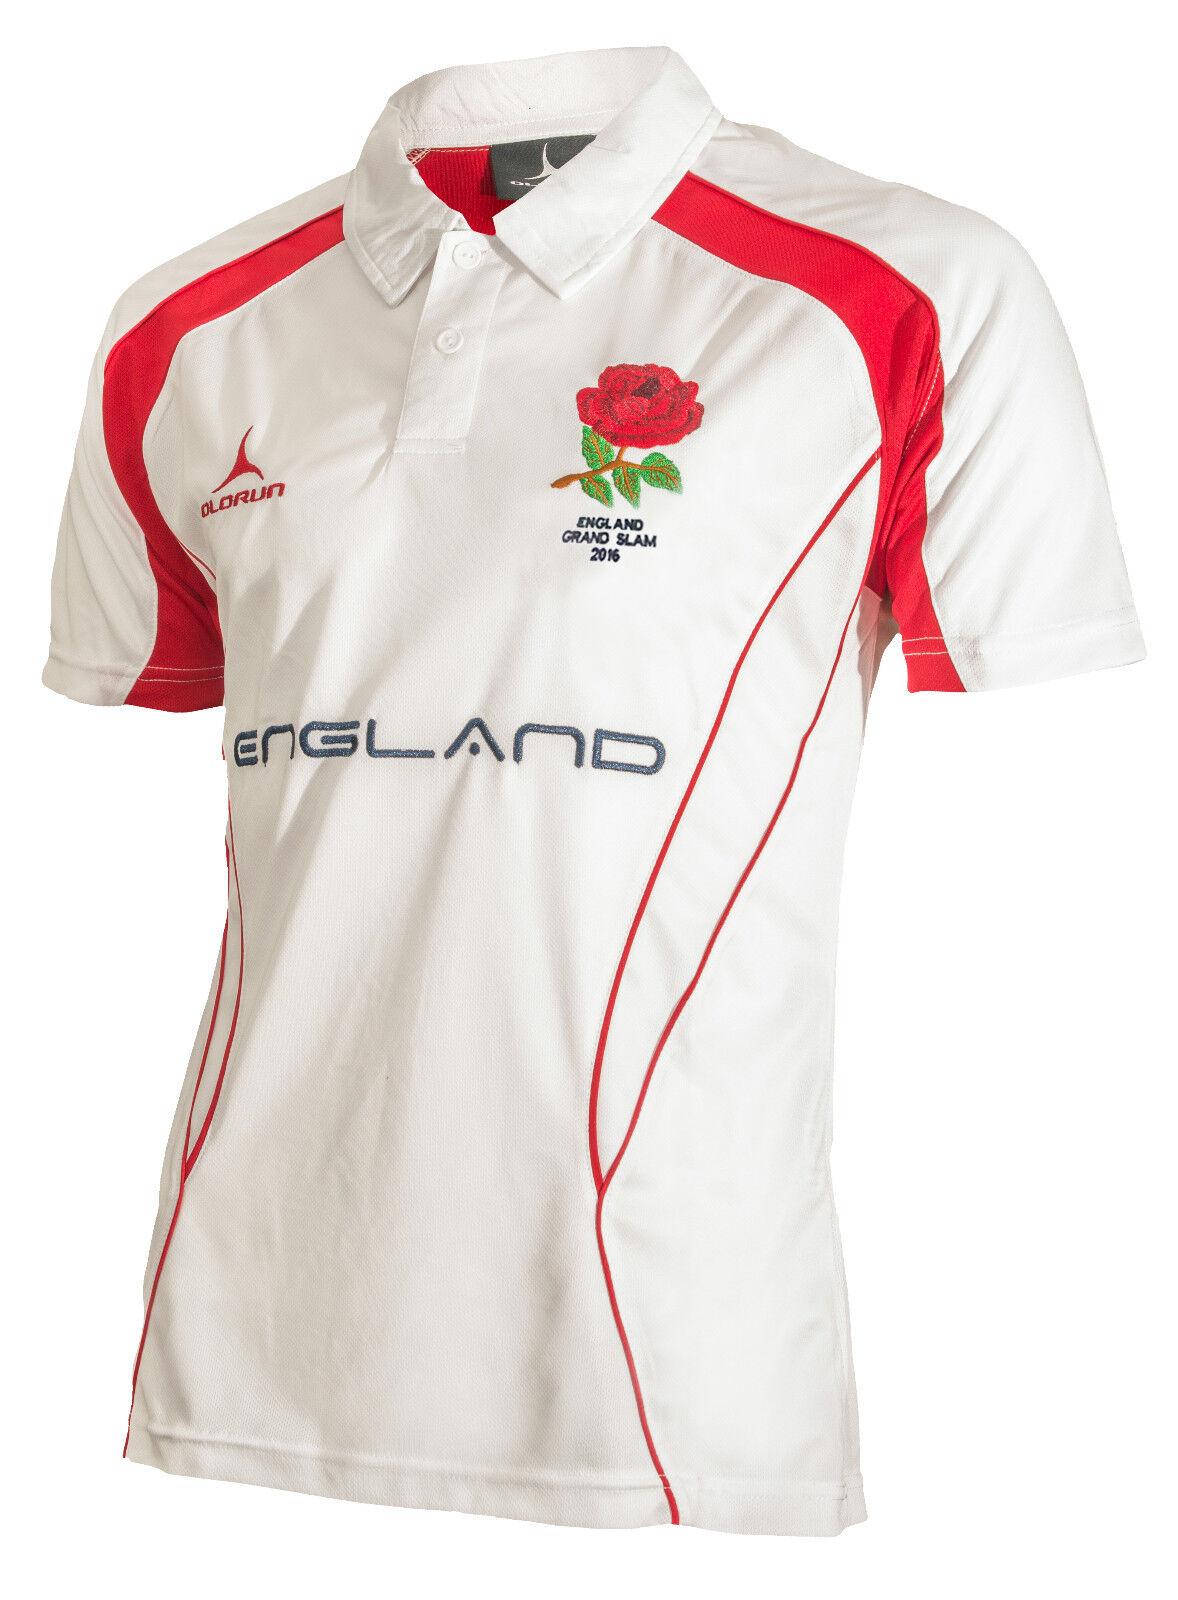 Olorun Olorun Olorun 6 Six Nations Grand Slam 2016 England Unterstützer Kultig Polohemd S-XXXL 941807